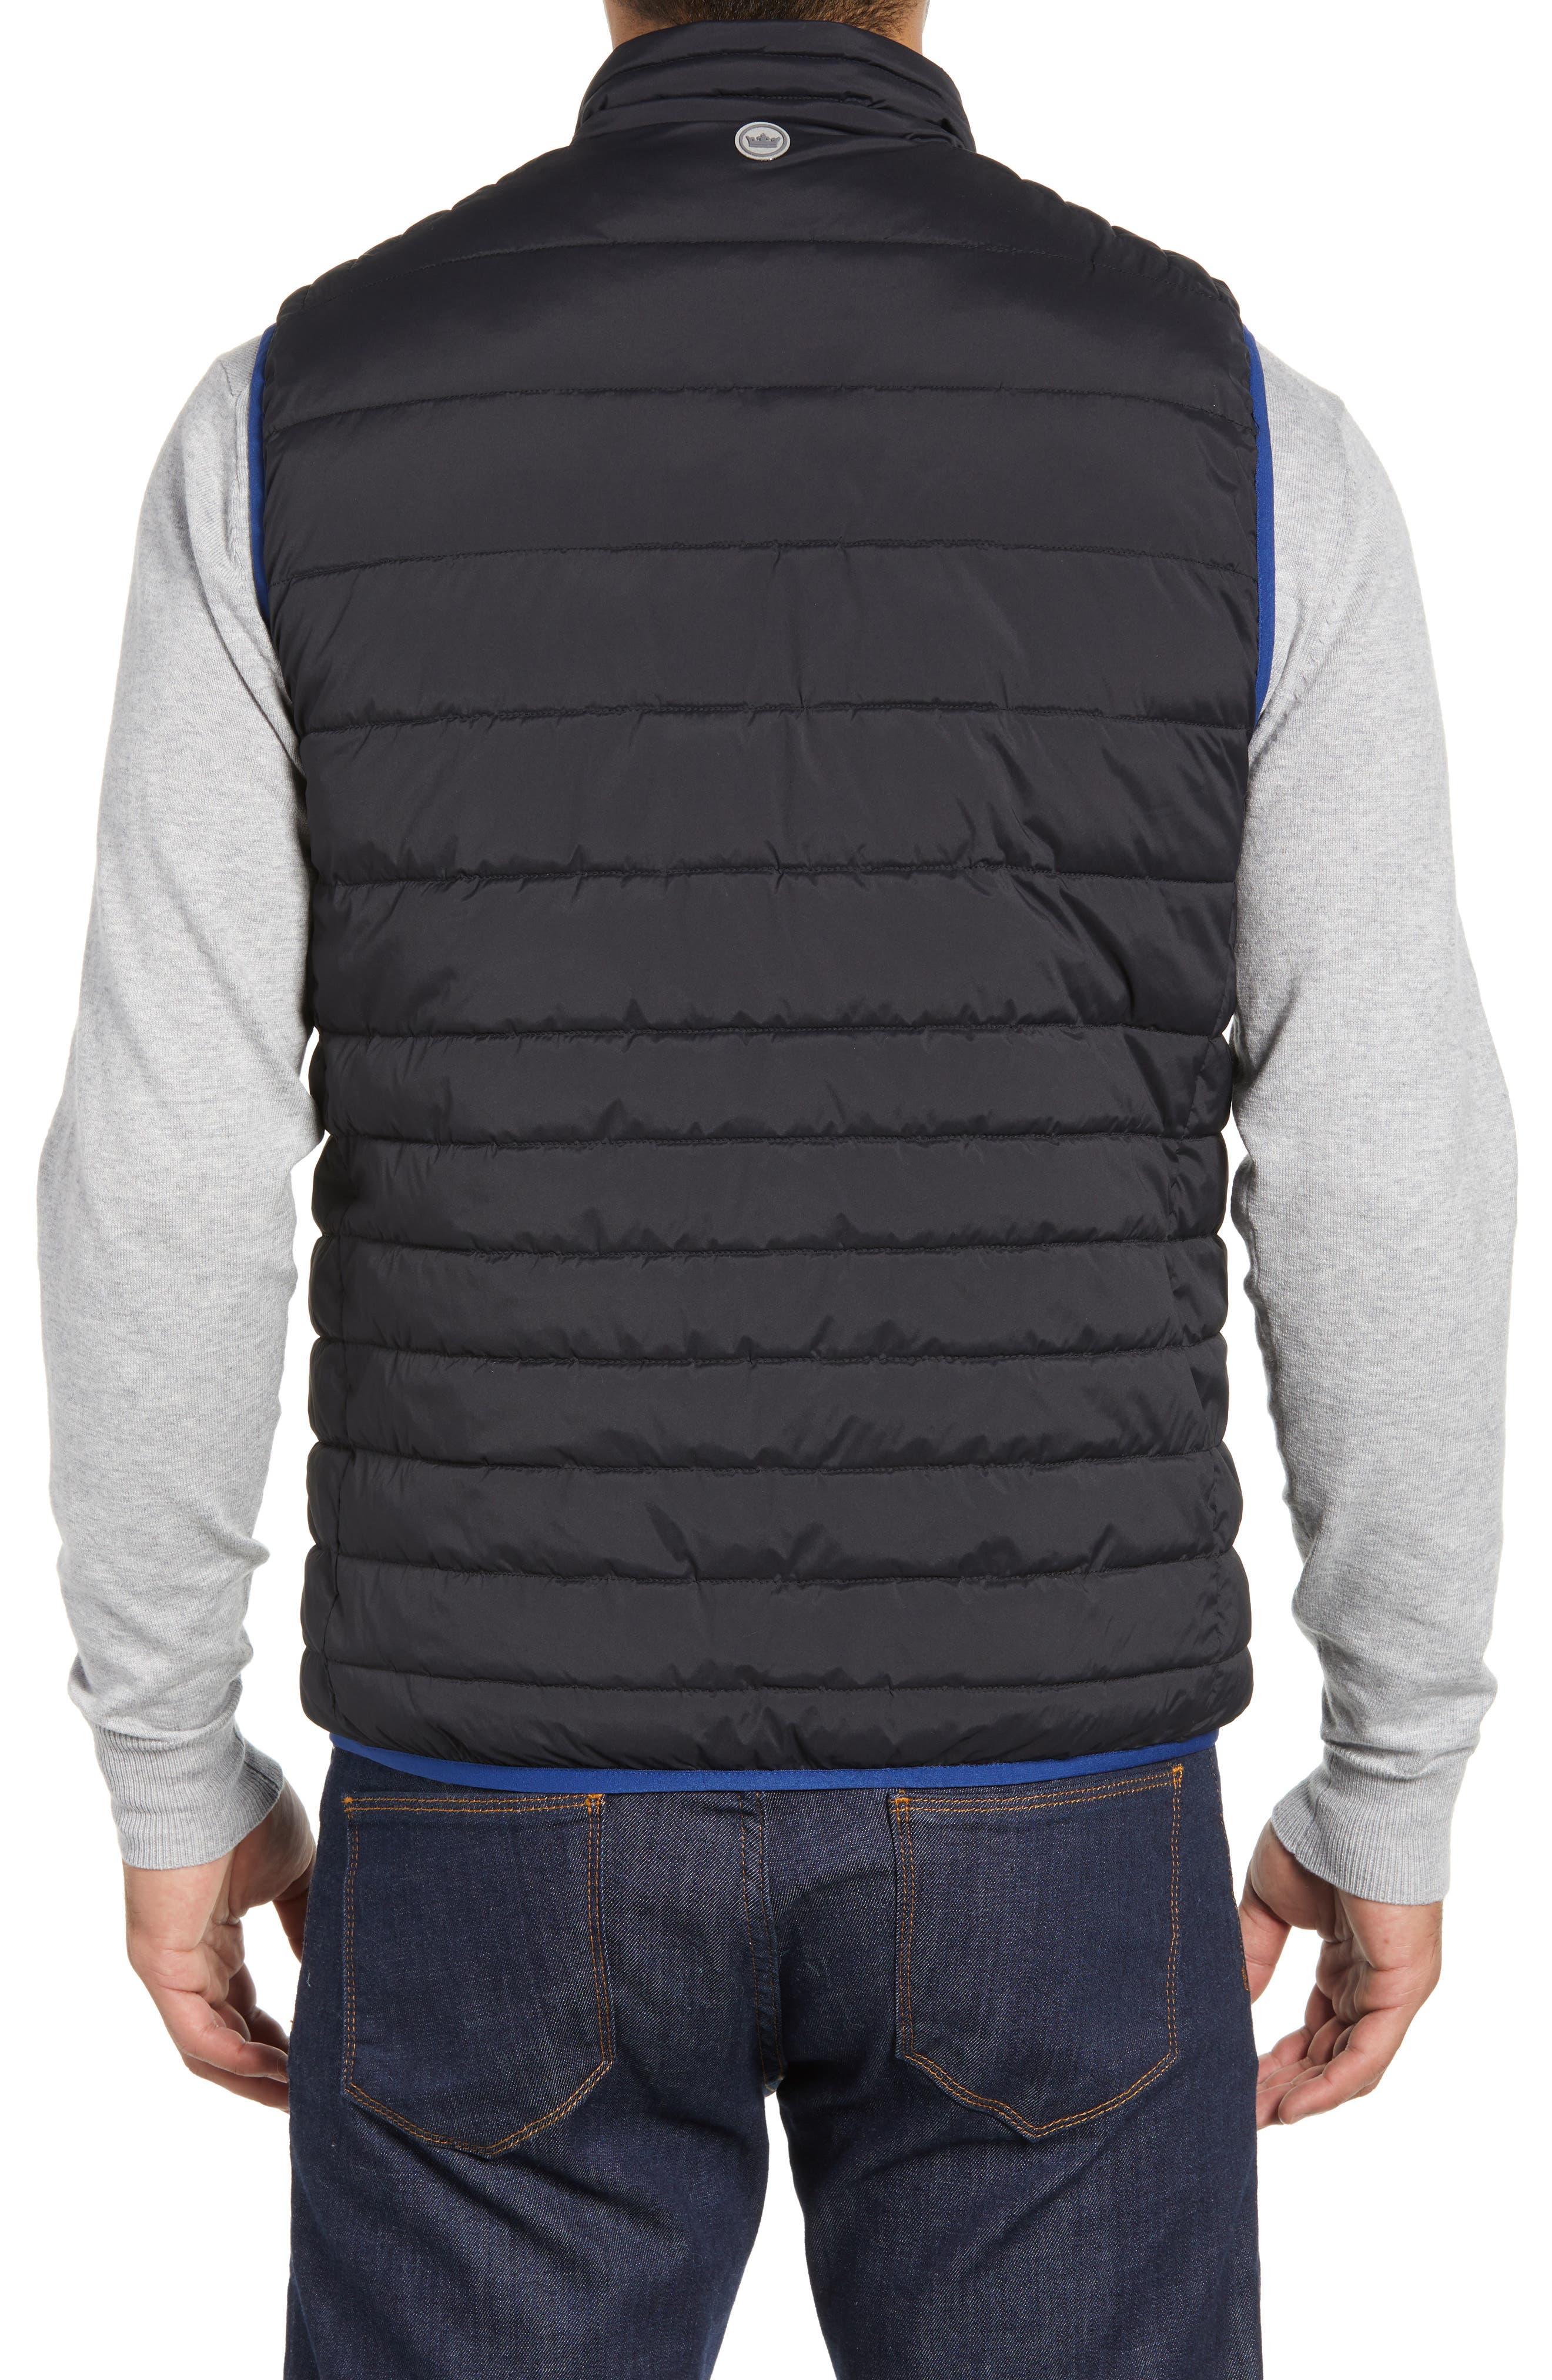 PETER MILLAR, Crown Elite Reversible Vest, Alternate thumbnail 4, color, BLACK/SAIL